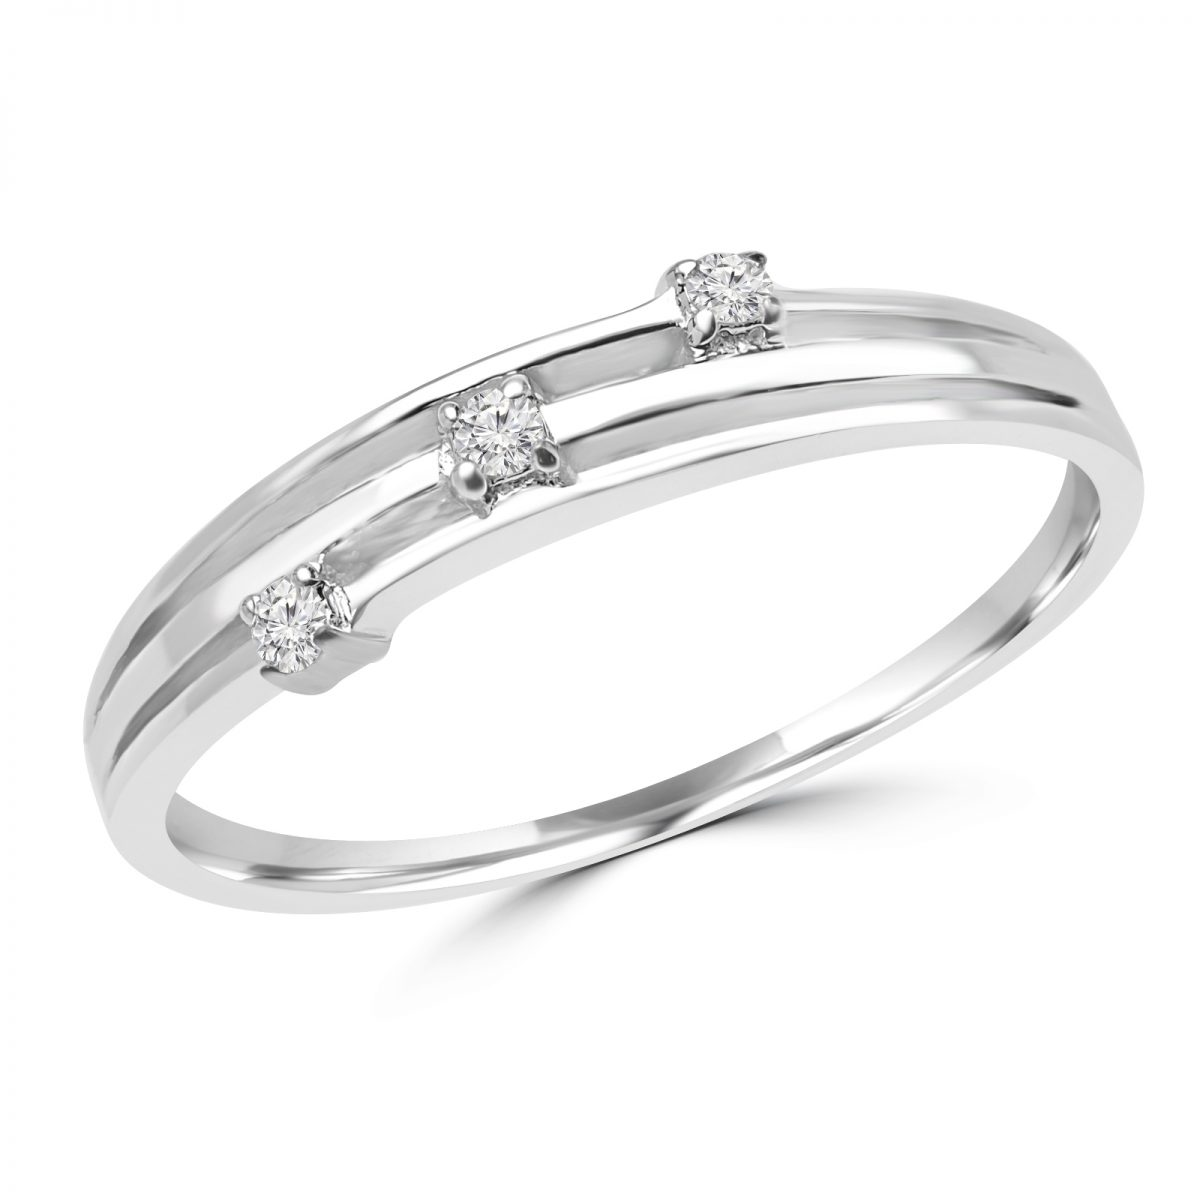 04 Carat Bands: 0.04 Carat Round Diamond Promise Ring In 10k White Gold